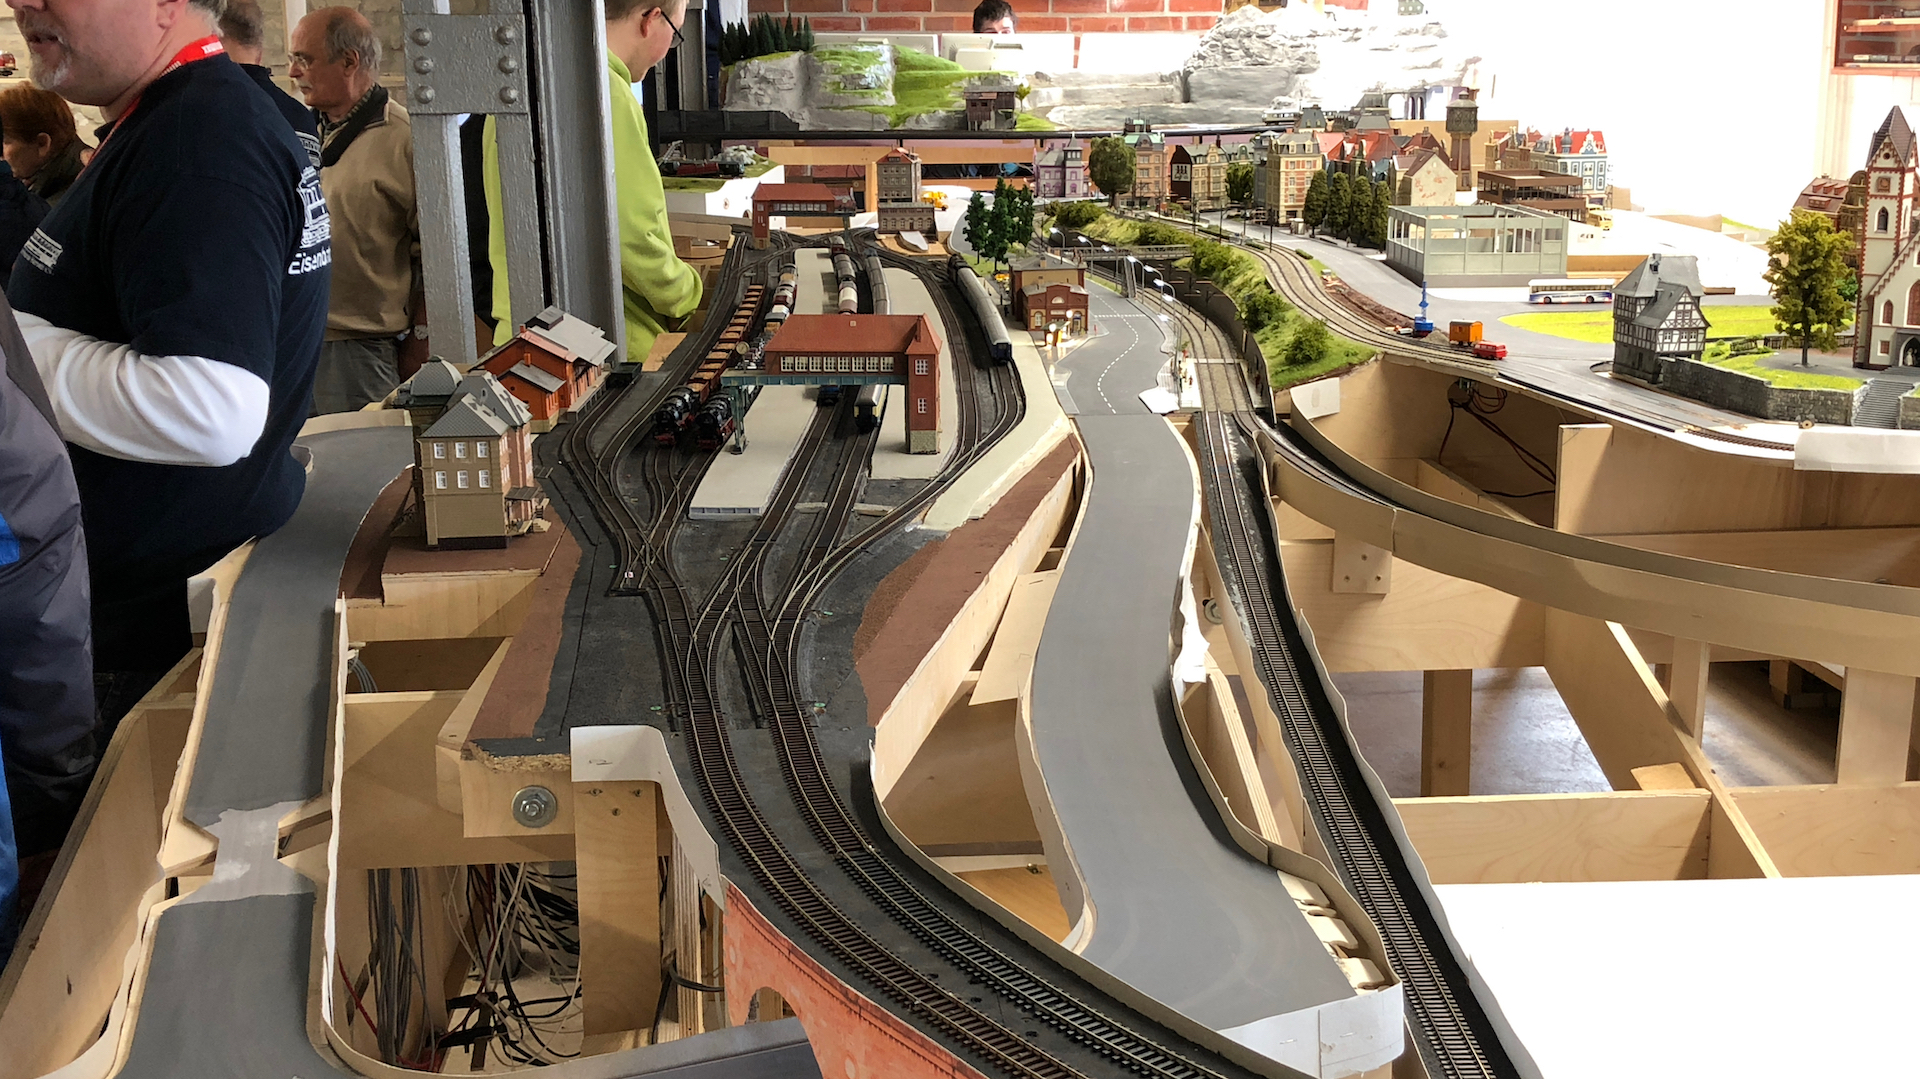 18_02_24_Schautag-Eisenbahnfreunde-Hameln_020